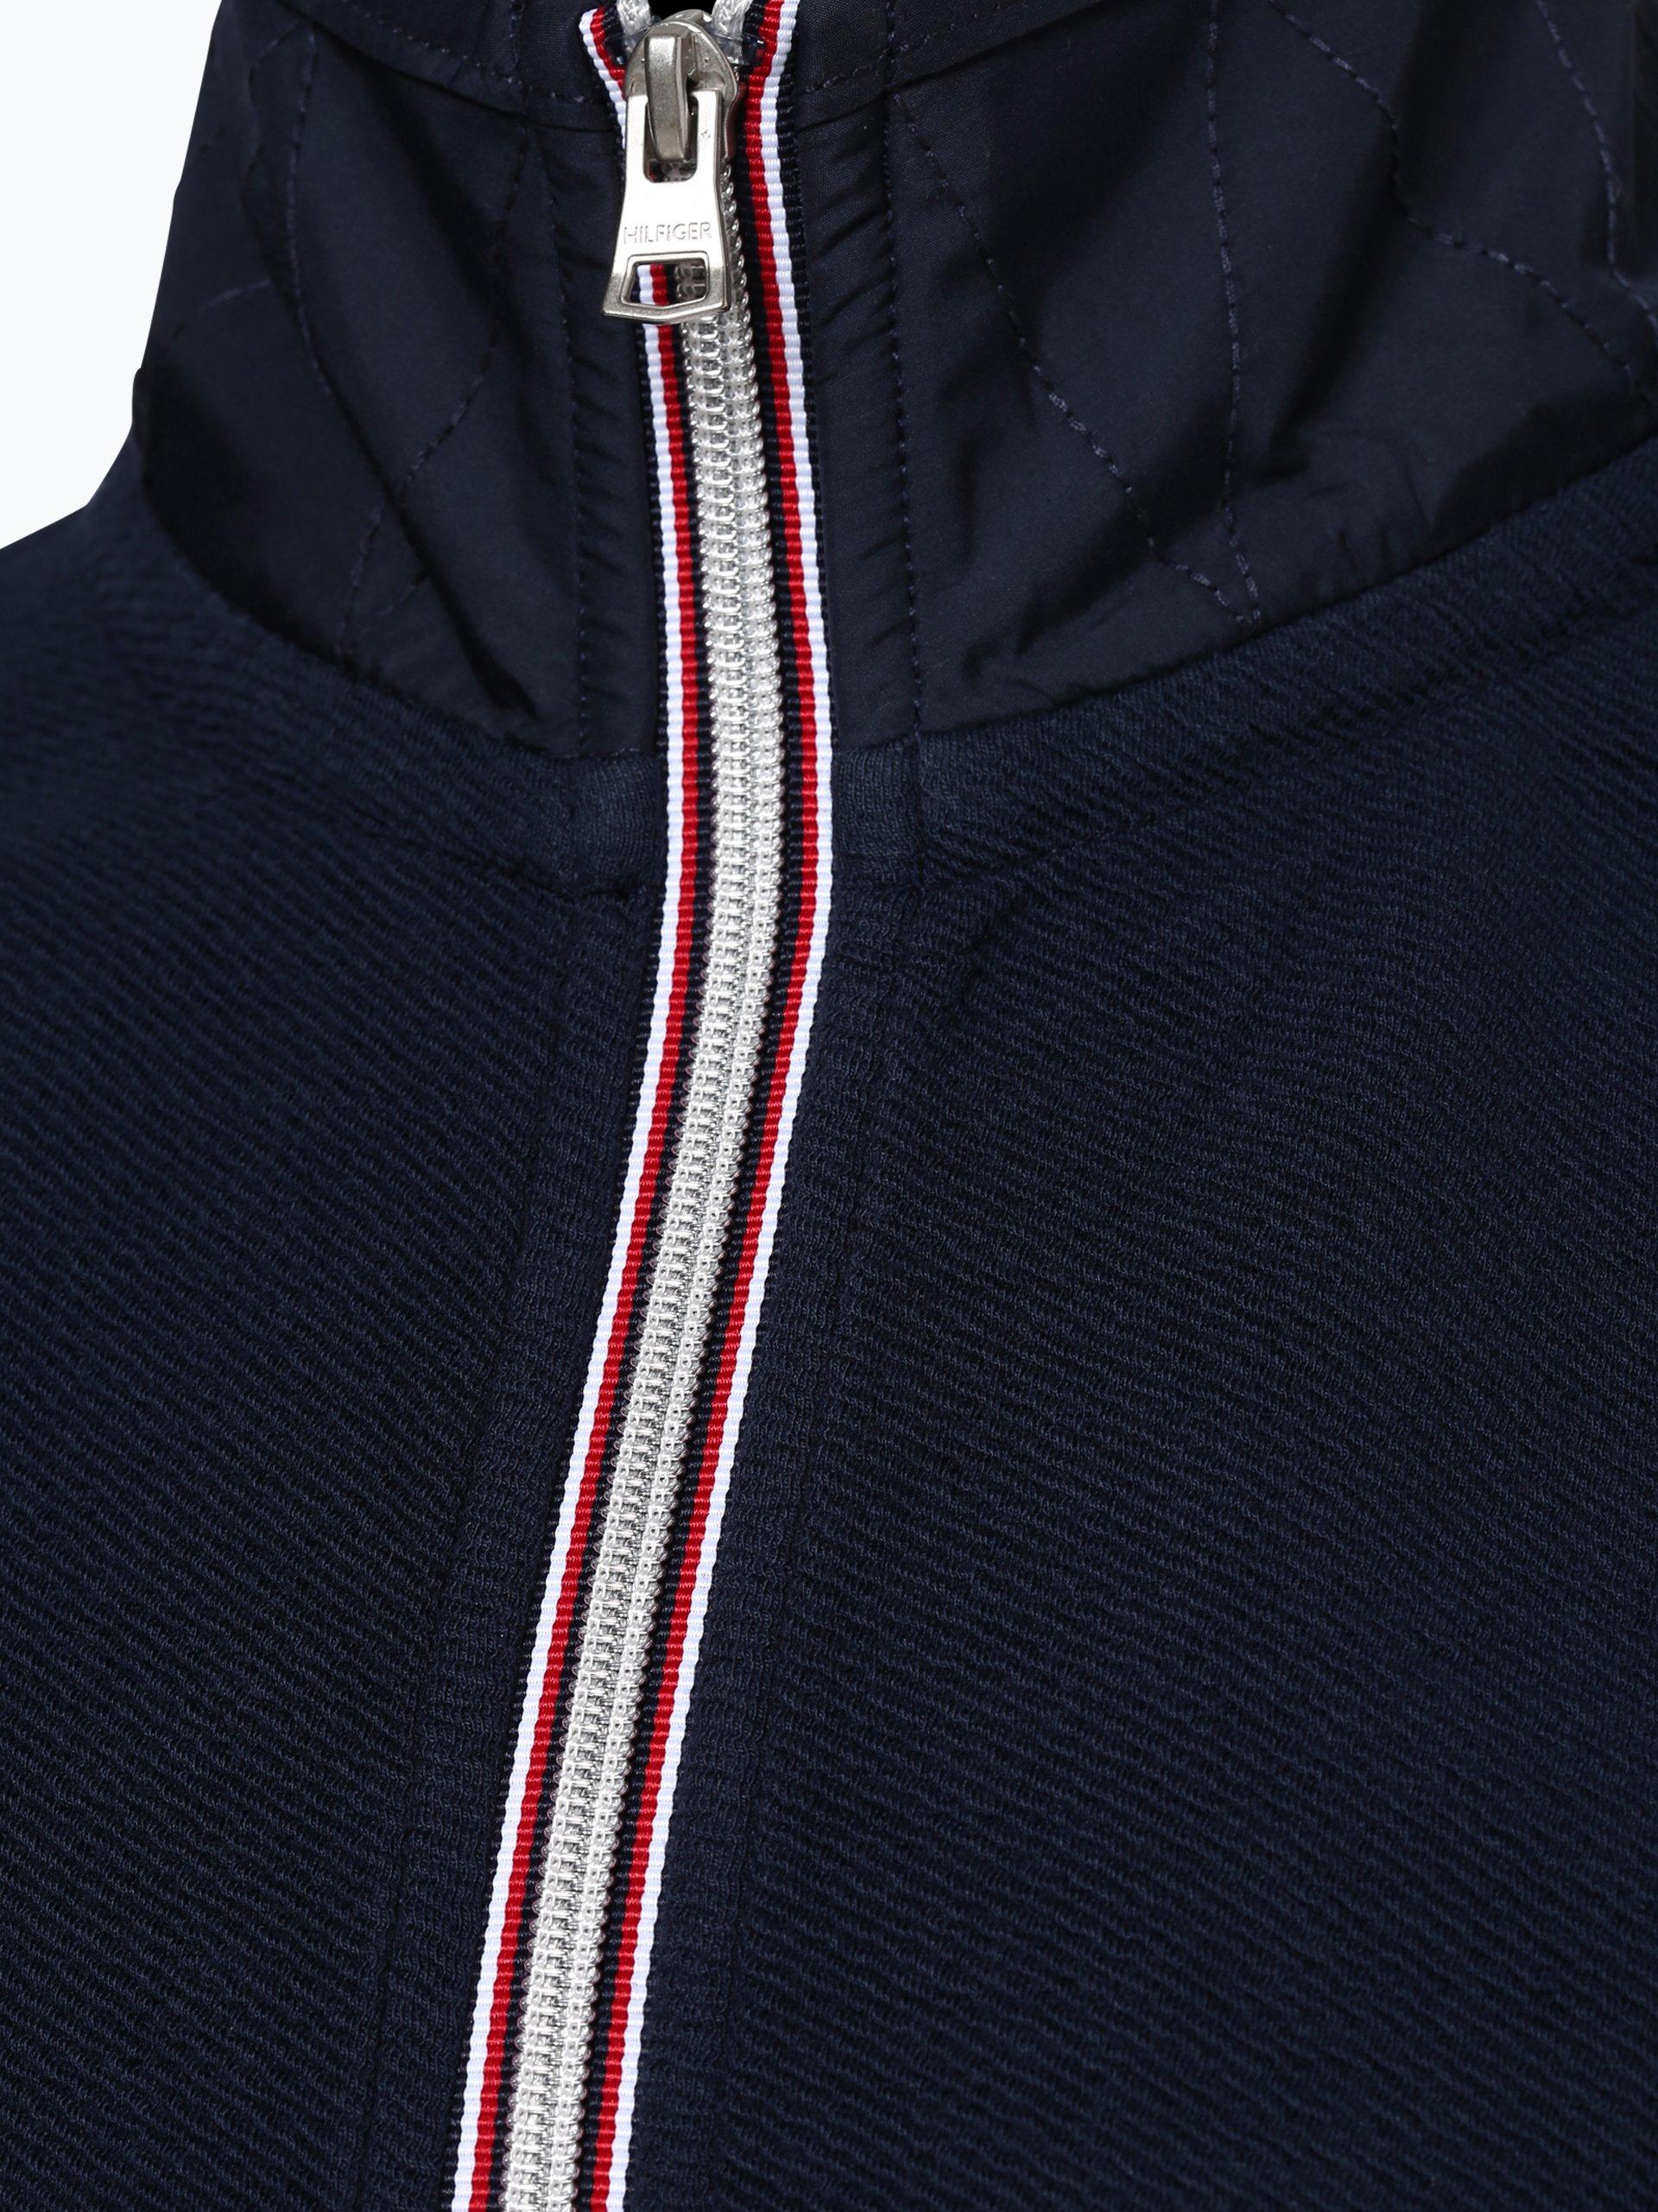 1ec00efdcfb04 Tommy Hilfiger Męska bluza rozpinana – Baxter kup online   VANGRAAF.COM